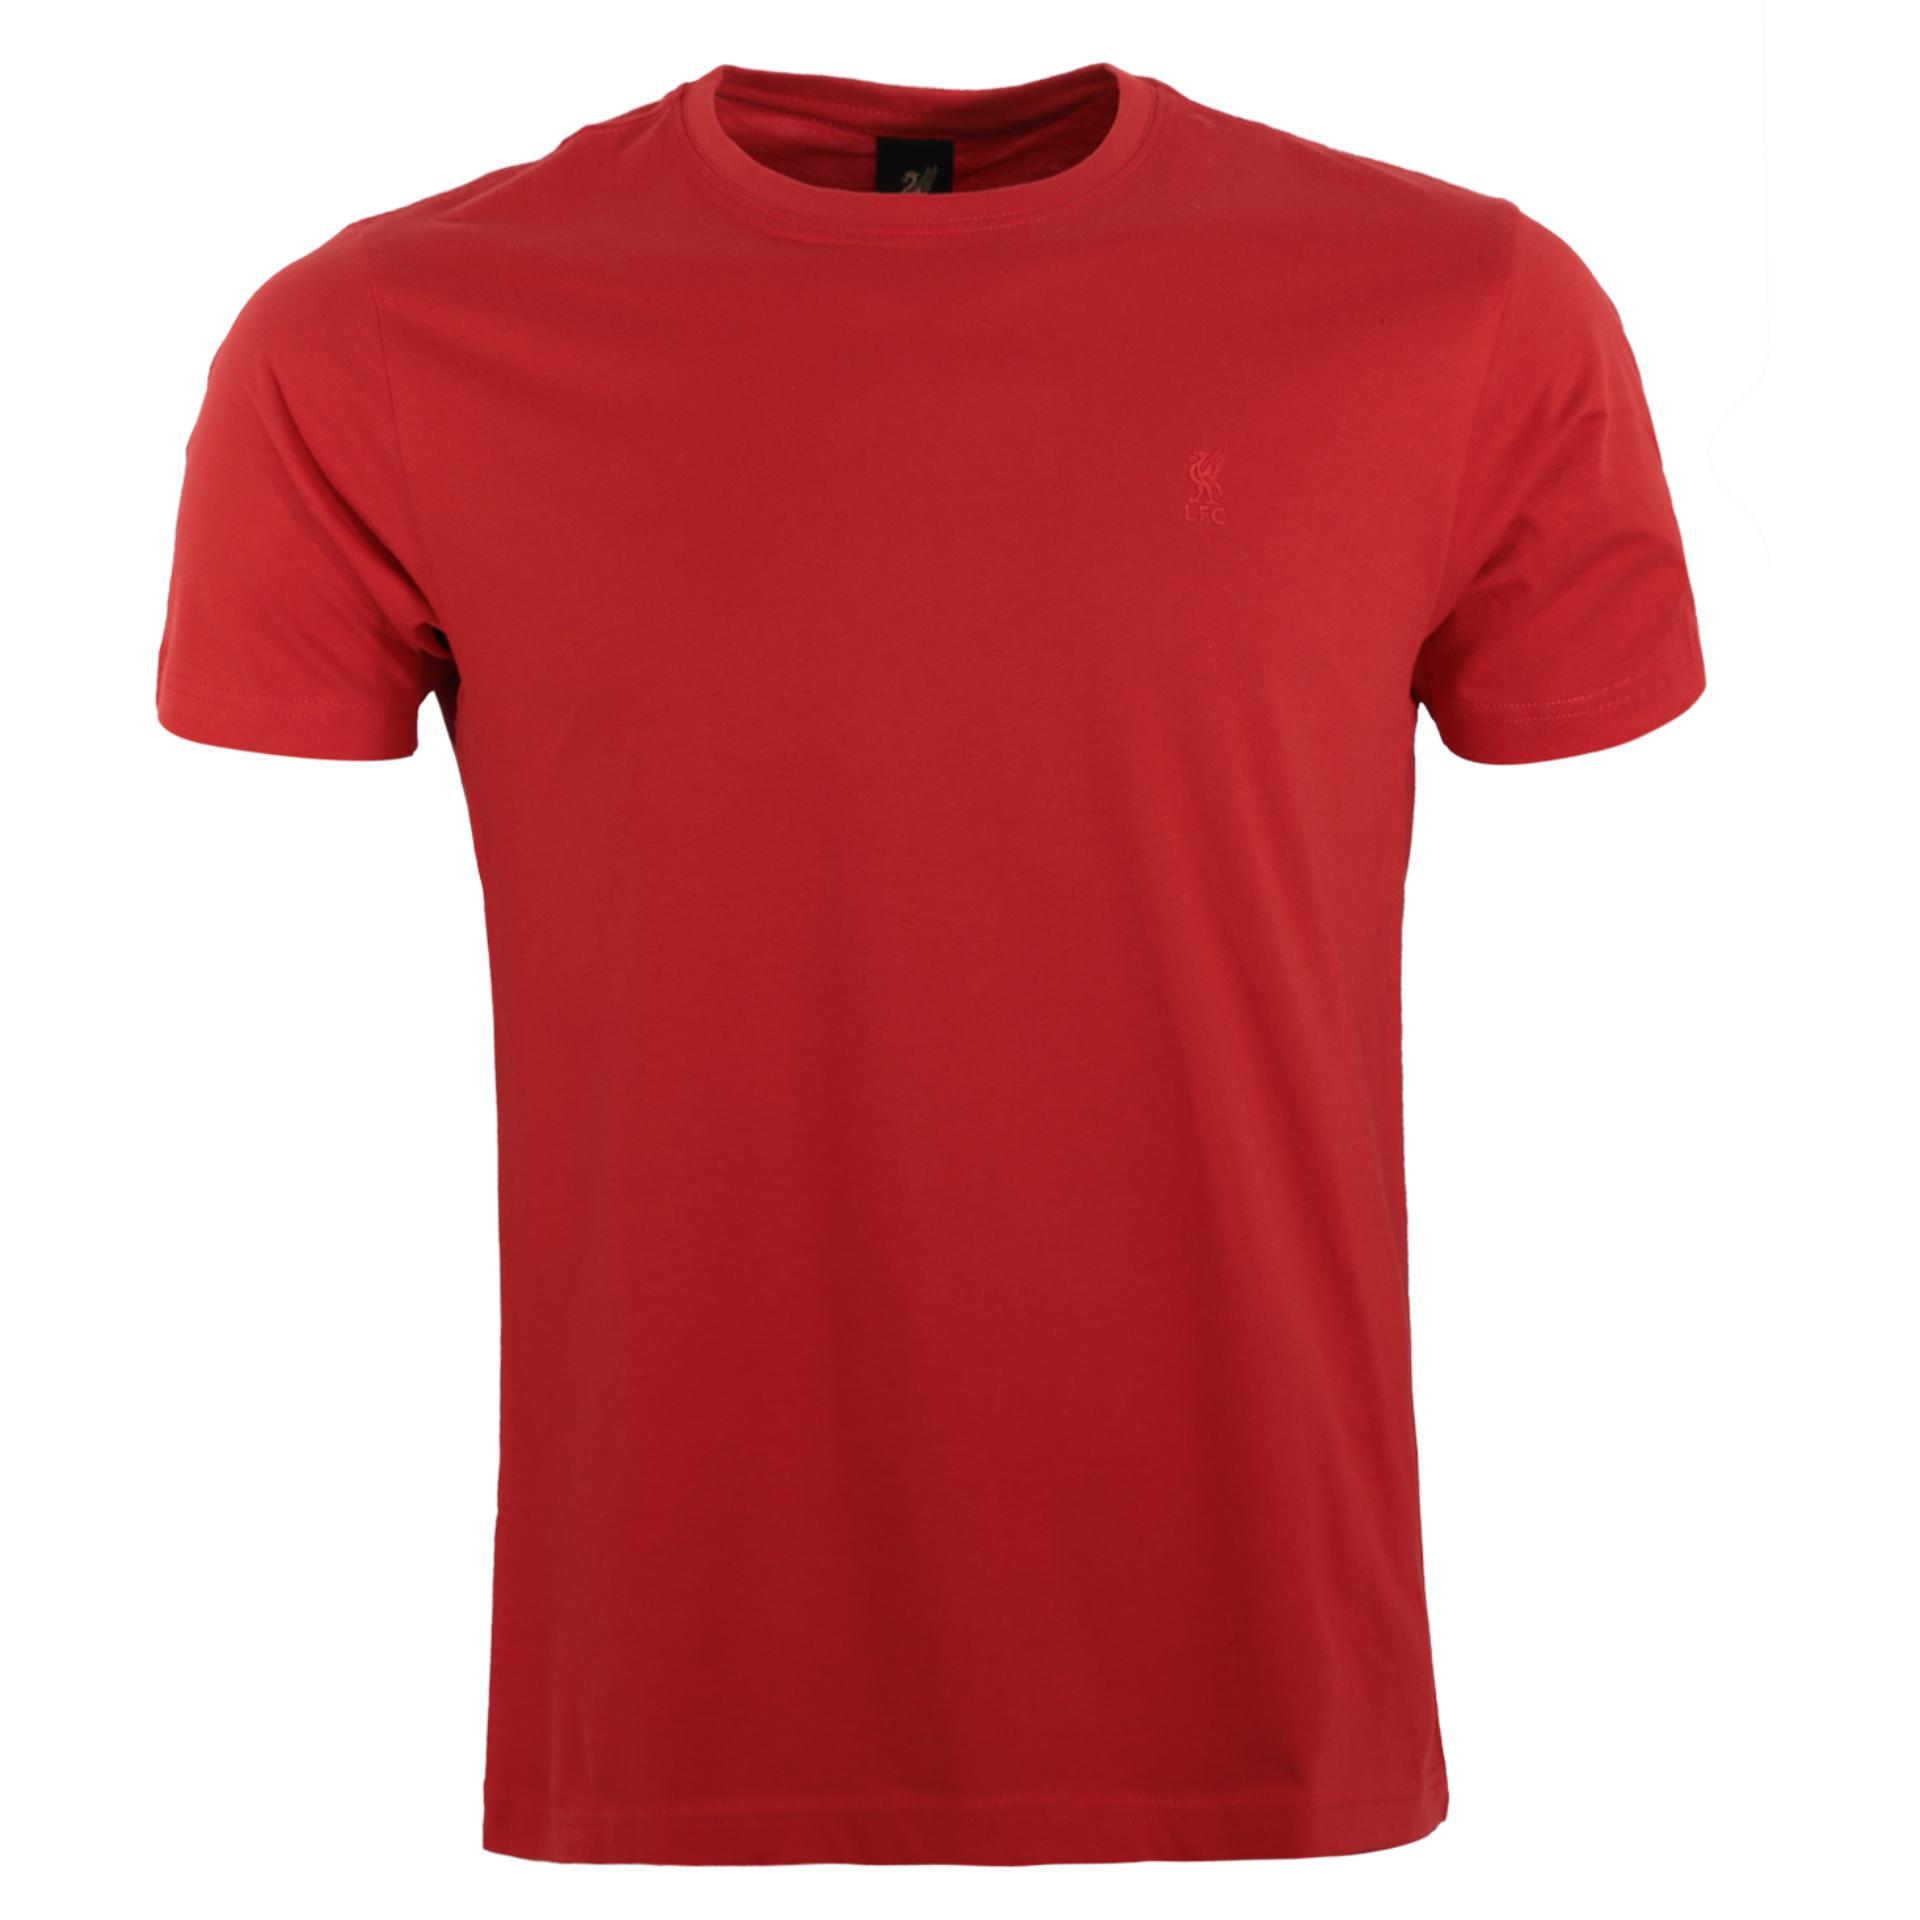 11gfn t-shirt liverpool logo – hitam